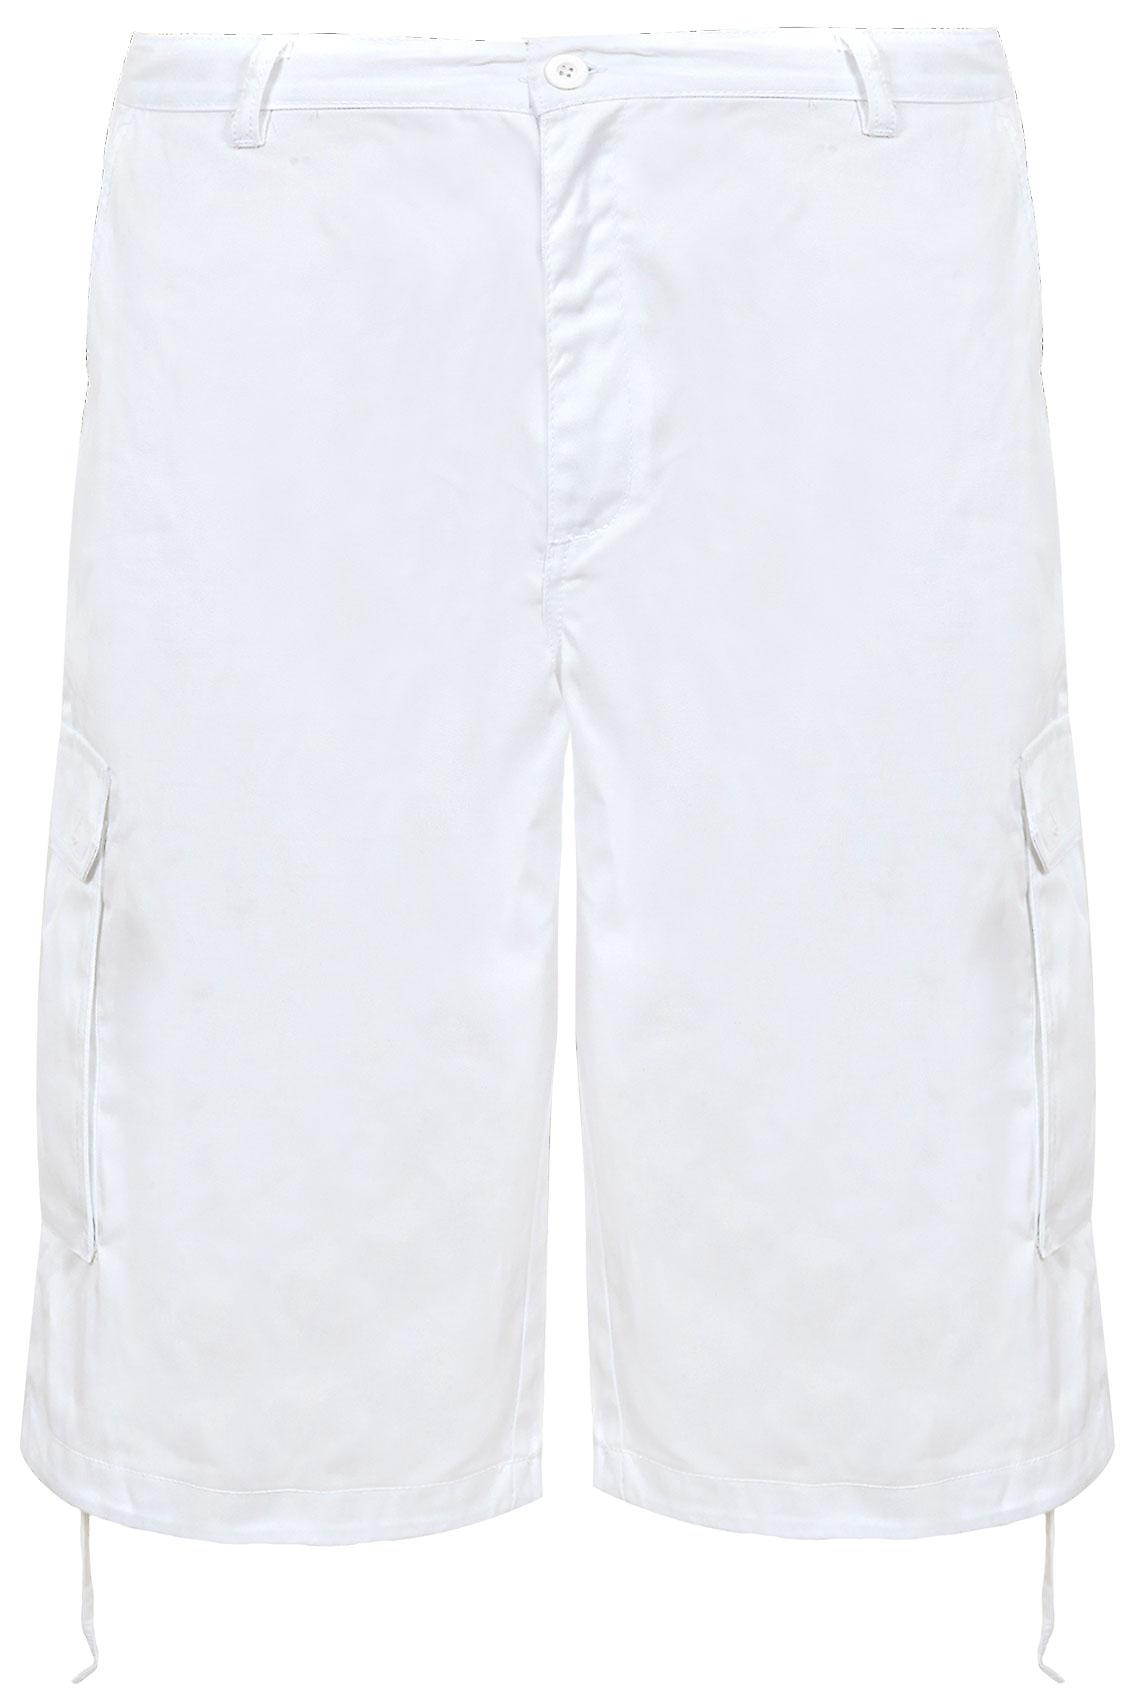 NOIZ White Cotton Cargo Shorts With Pockets